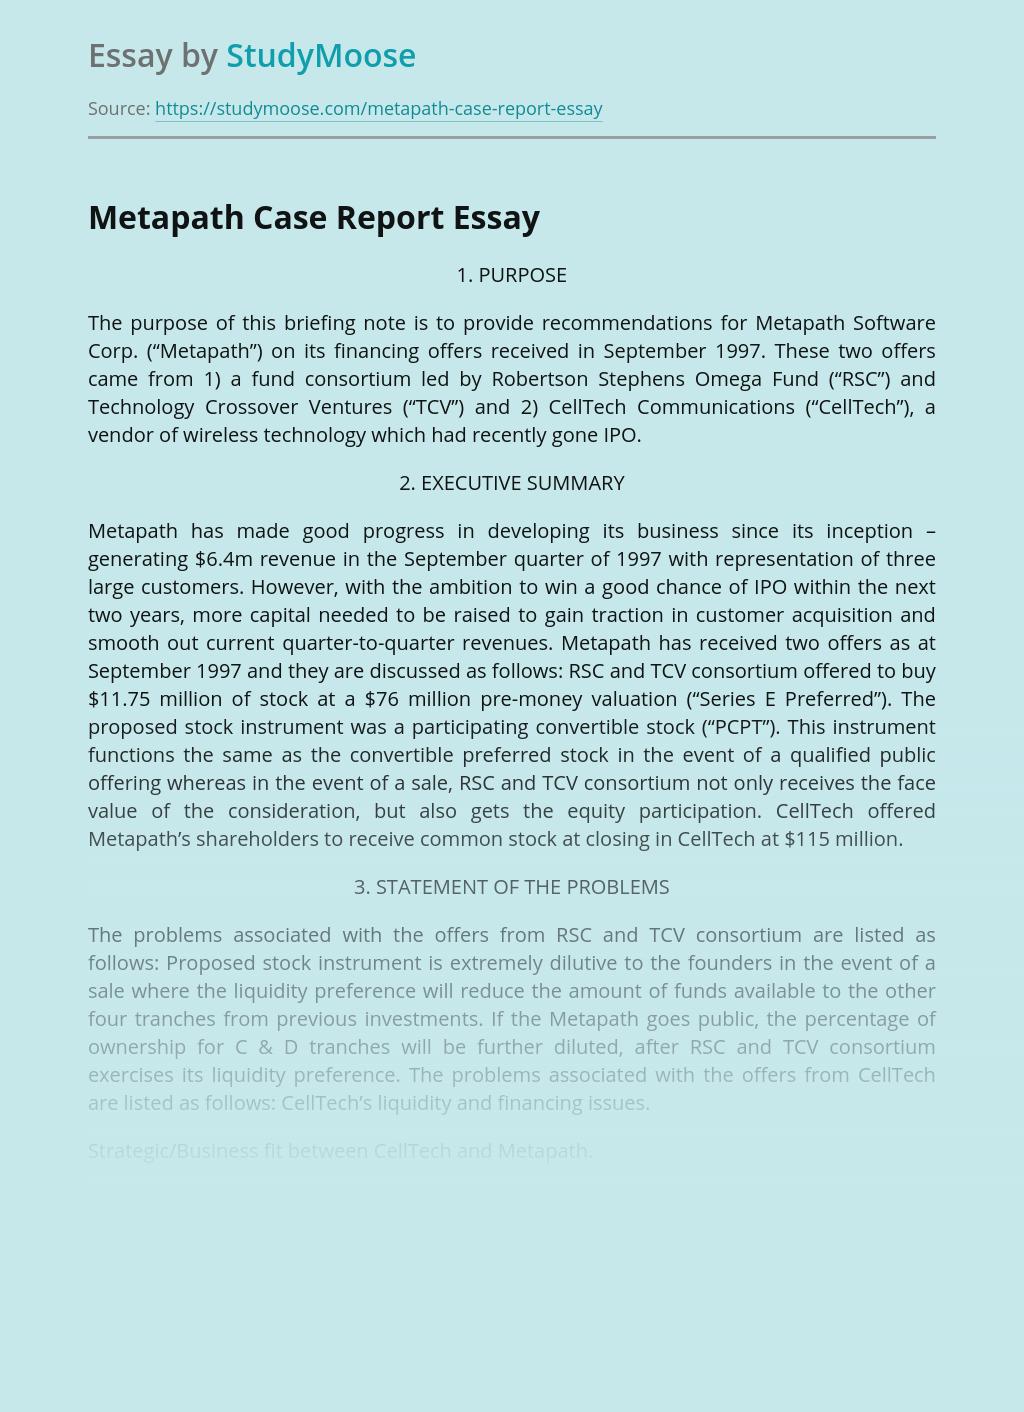 Metapath Case Report